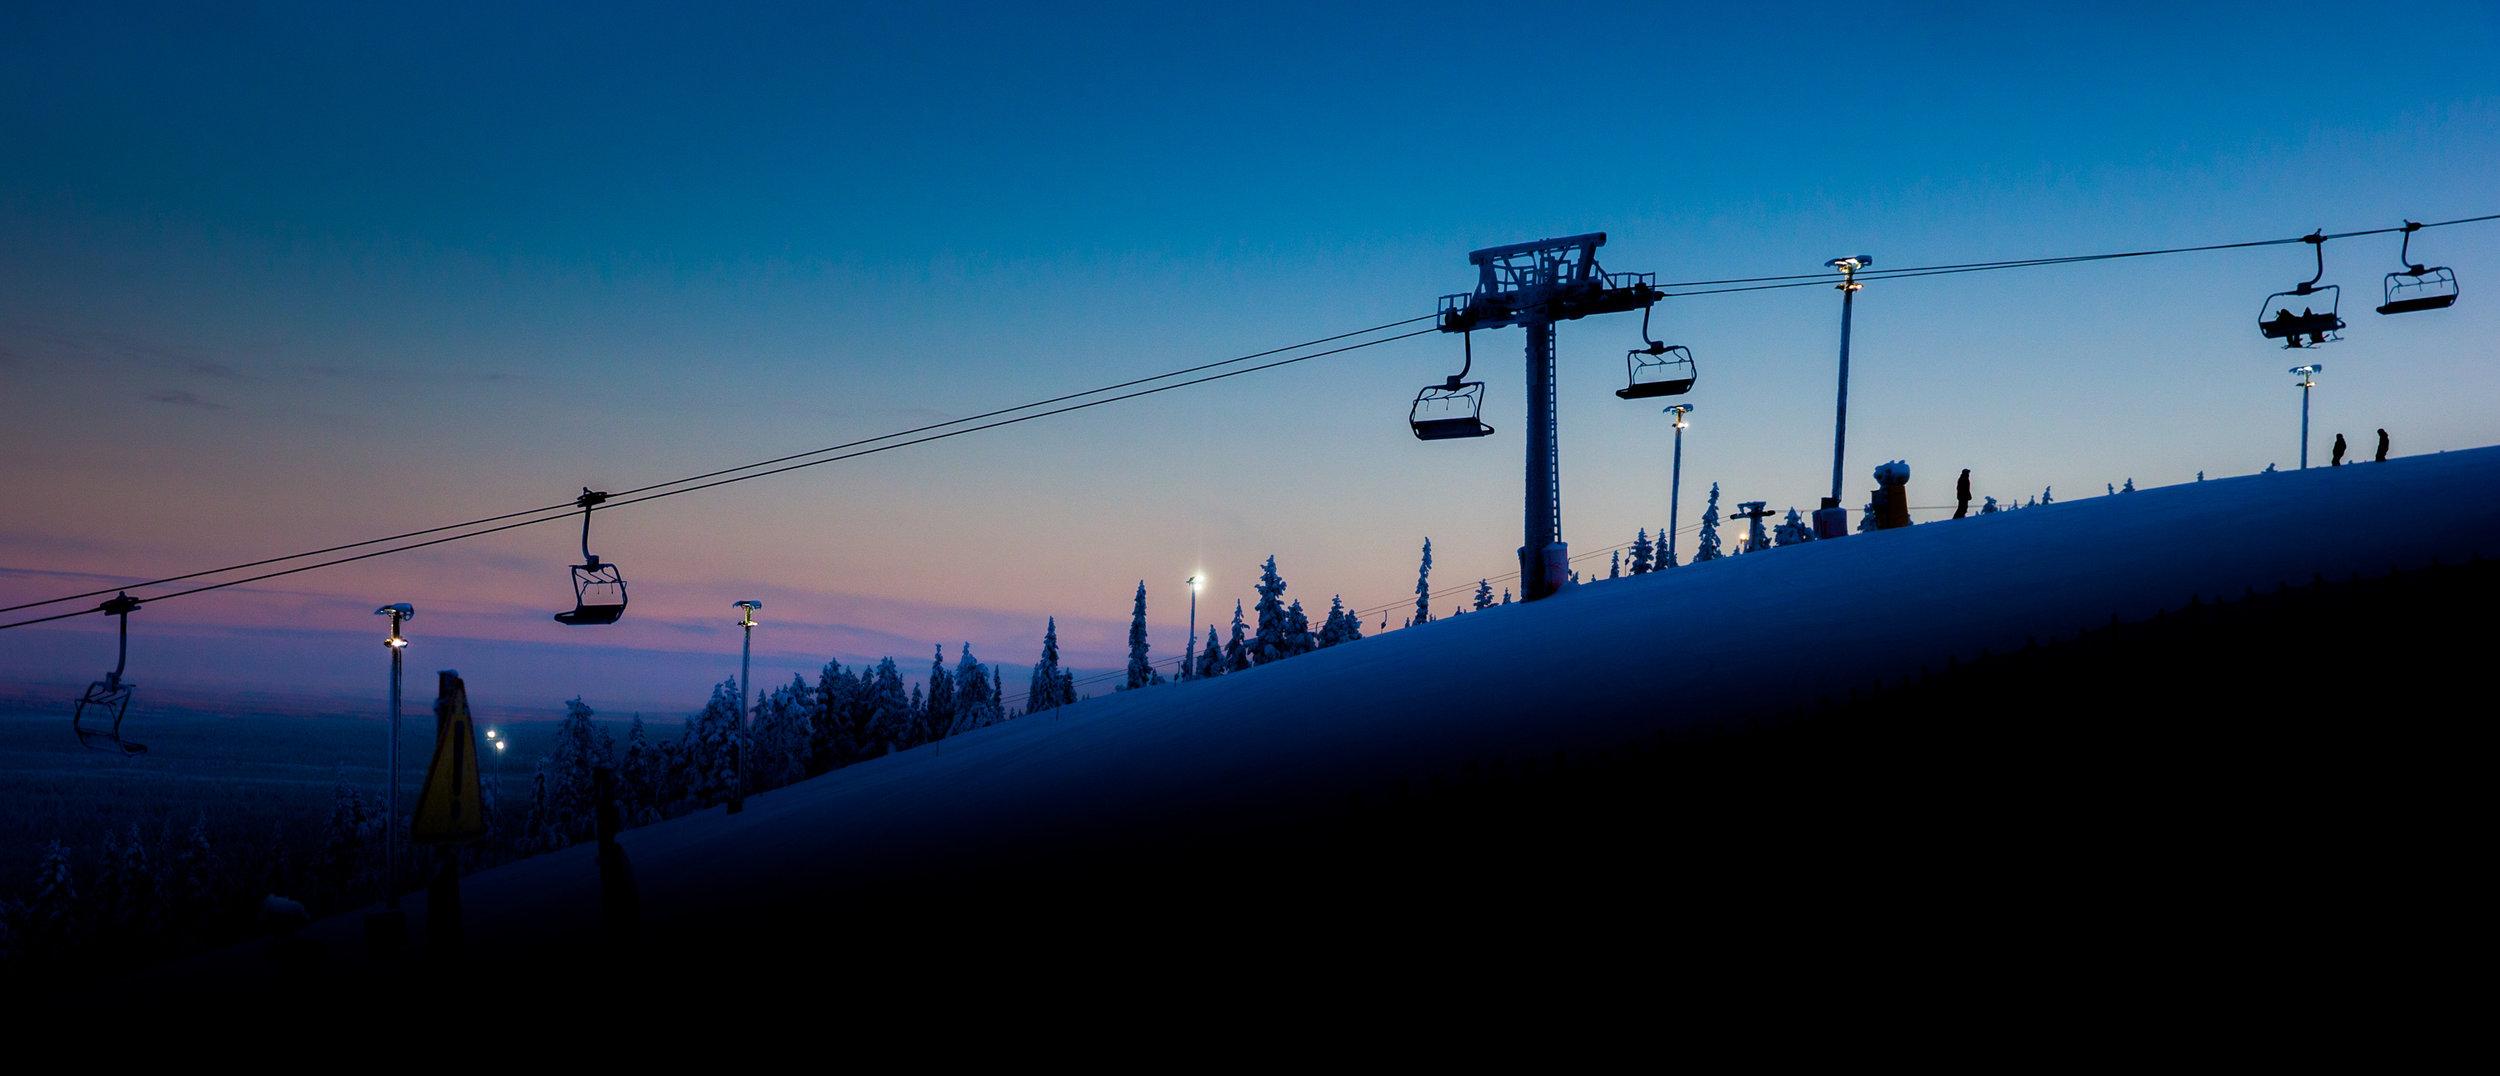 Thetravelhub_Levi Ski Slope_lapland.jpg